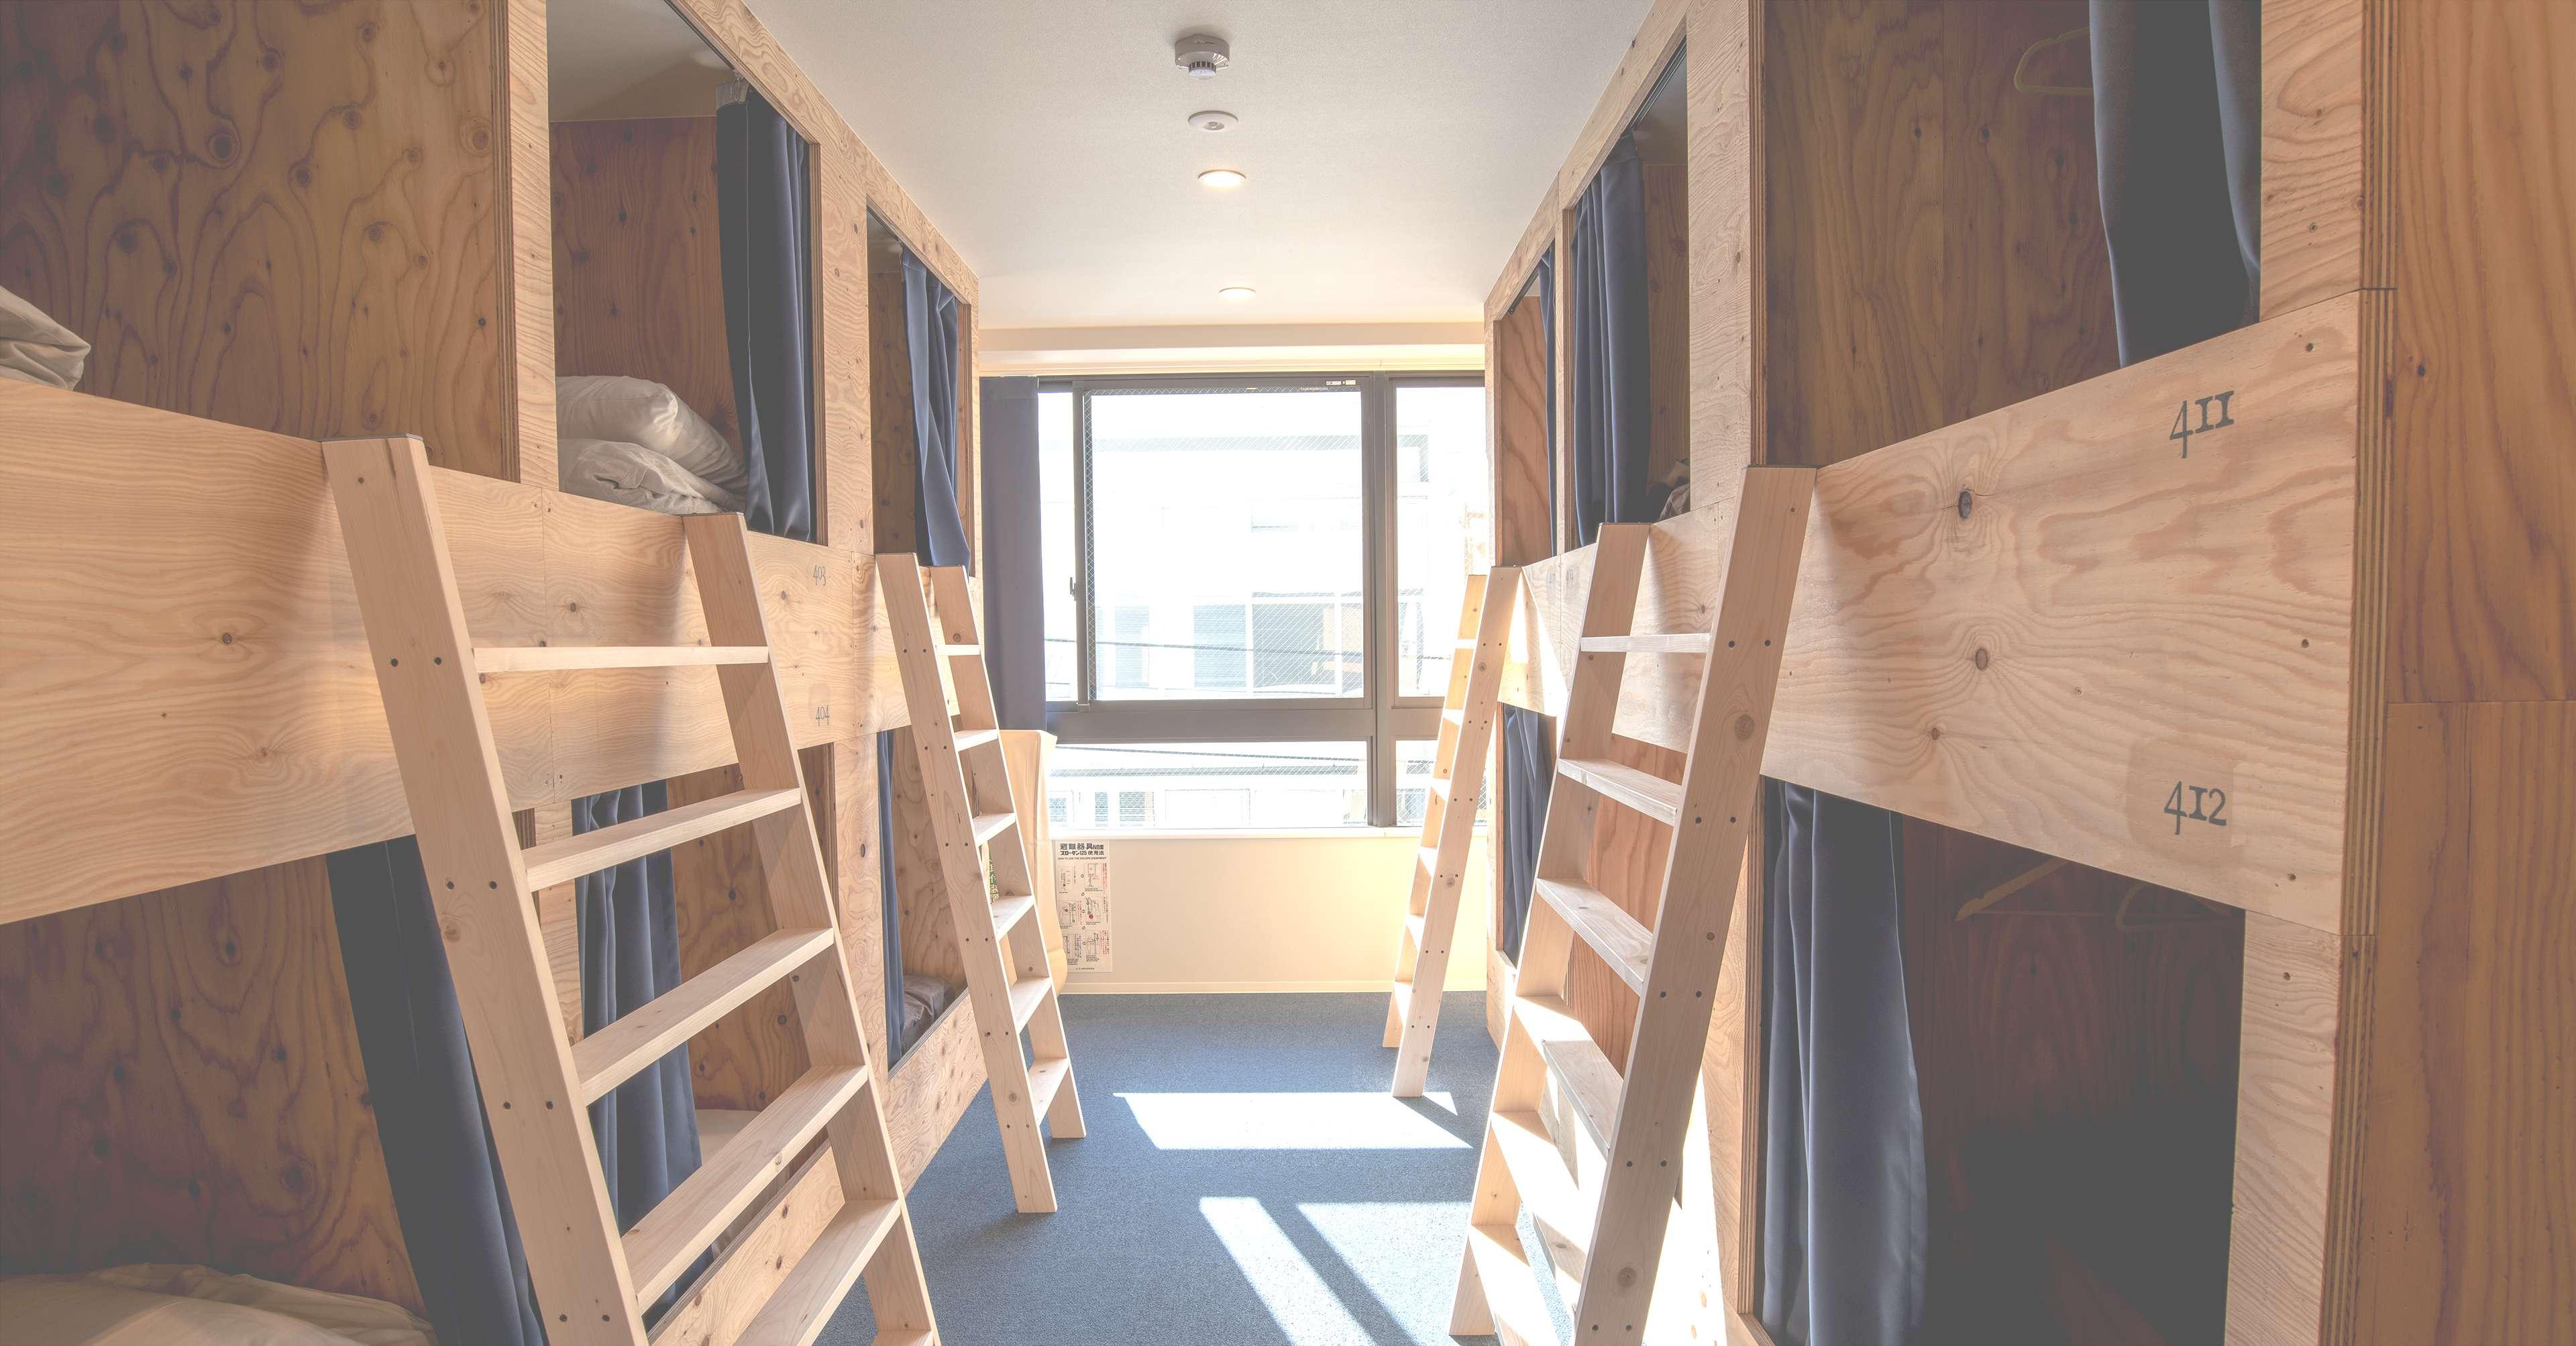 akicafe inn guesthouseのドミトリー寝室の画像